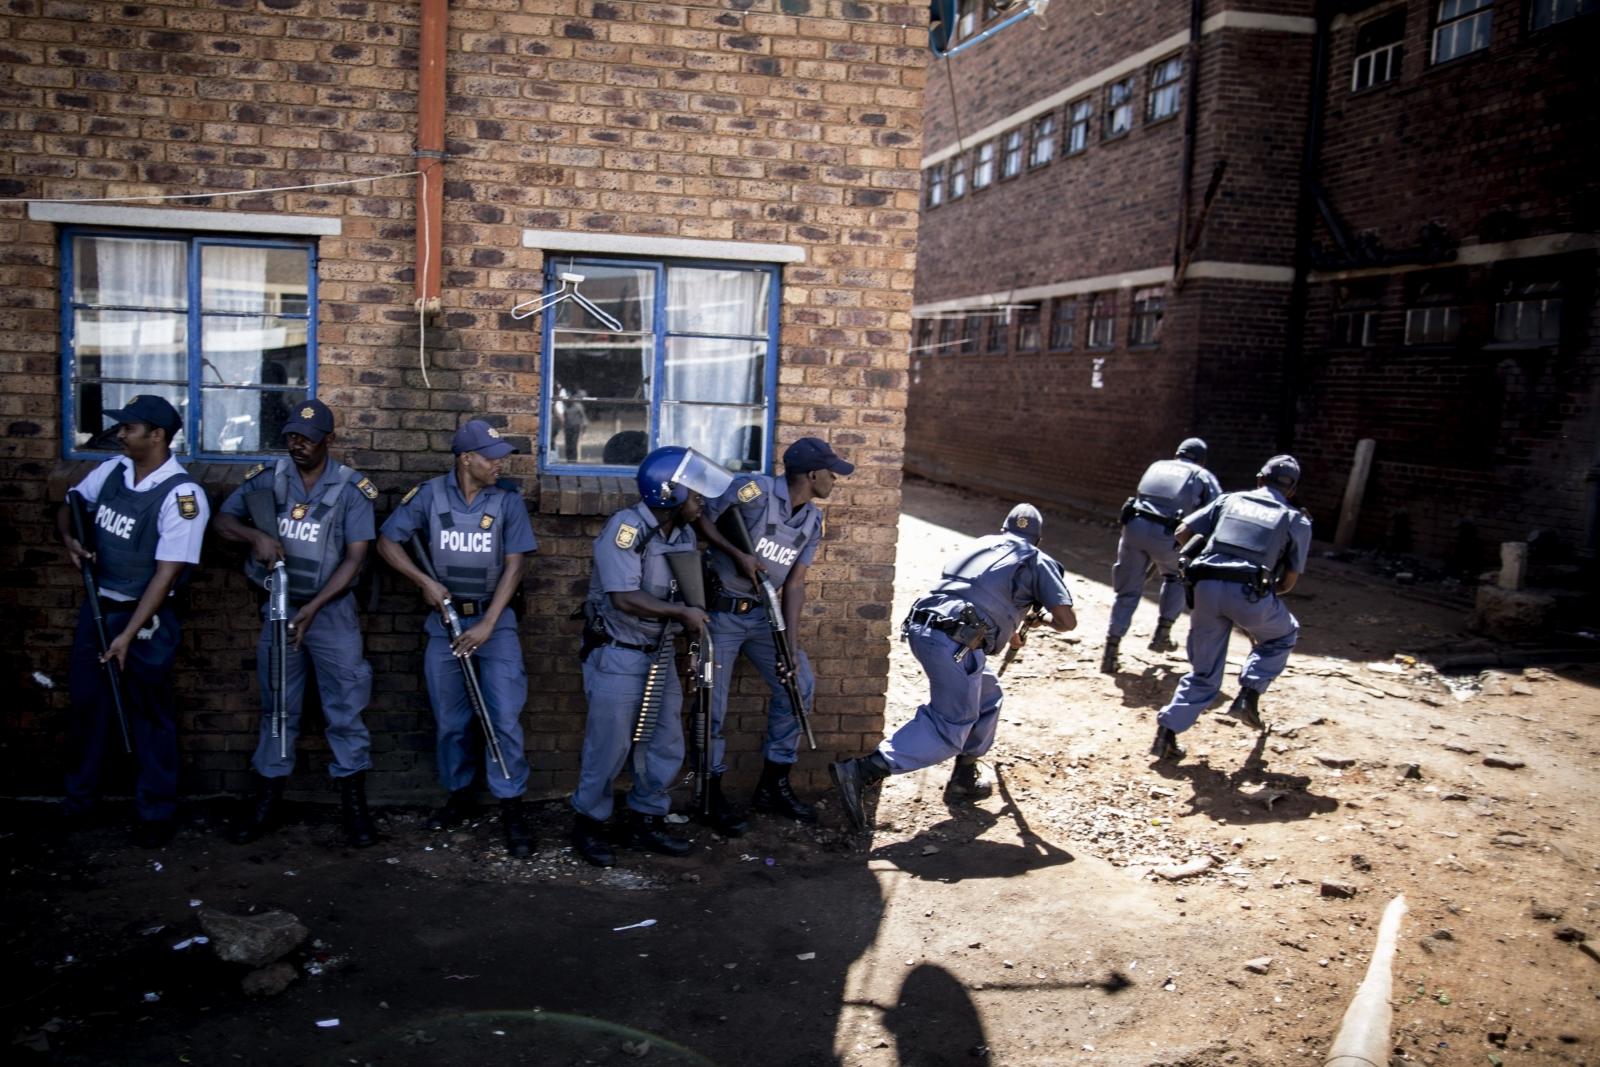 Riot police in Johannesburg